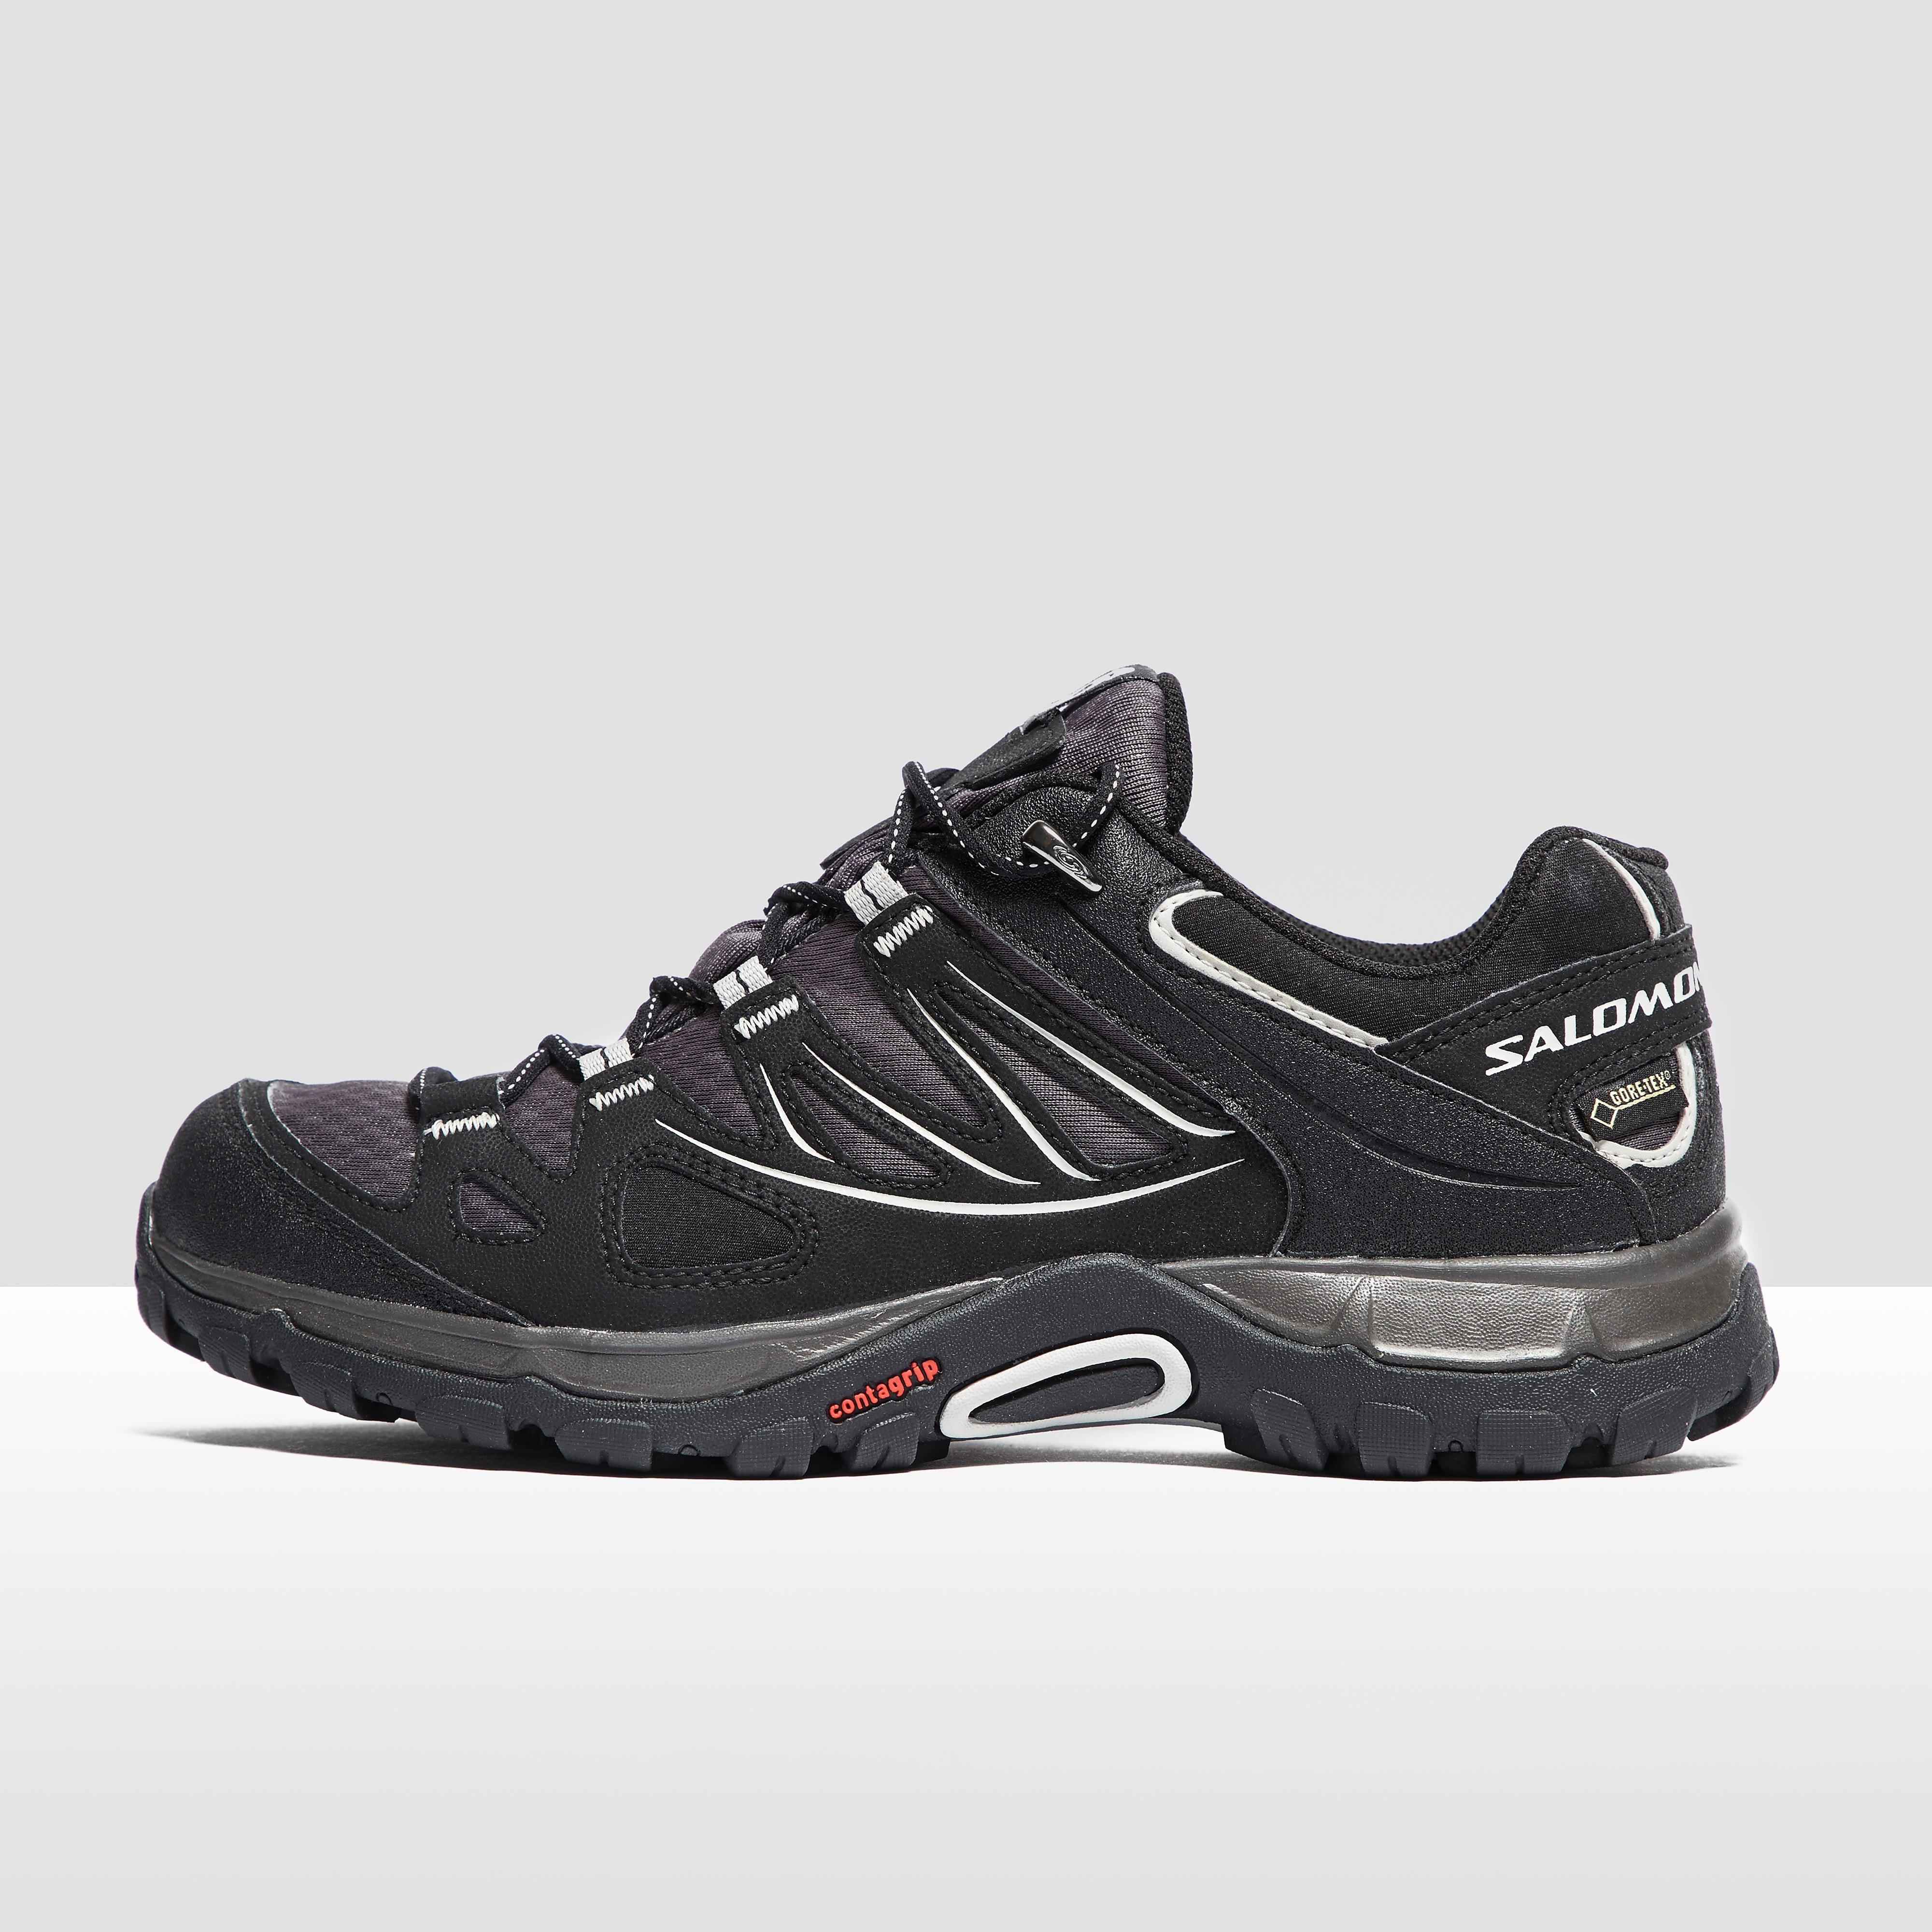 Salomon Ellipse Hiking Shoes